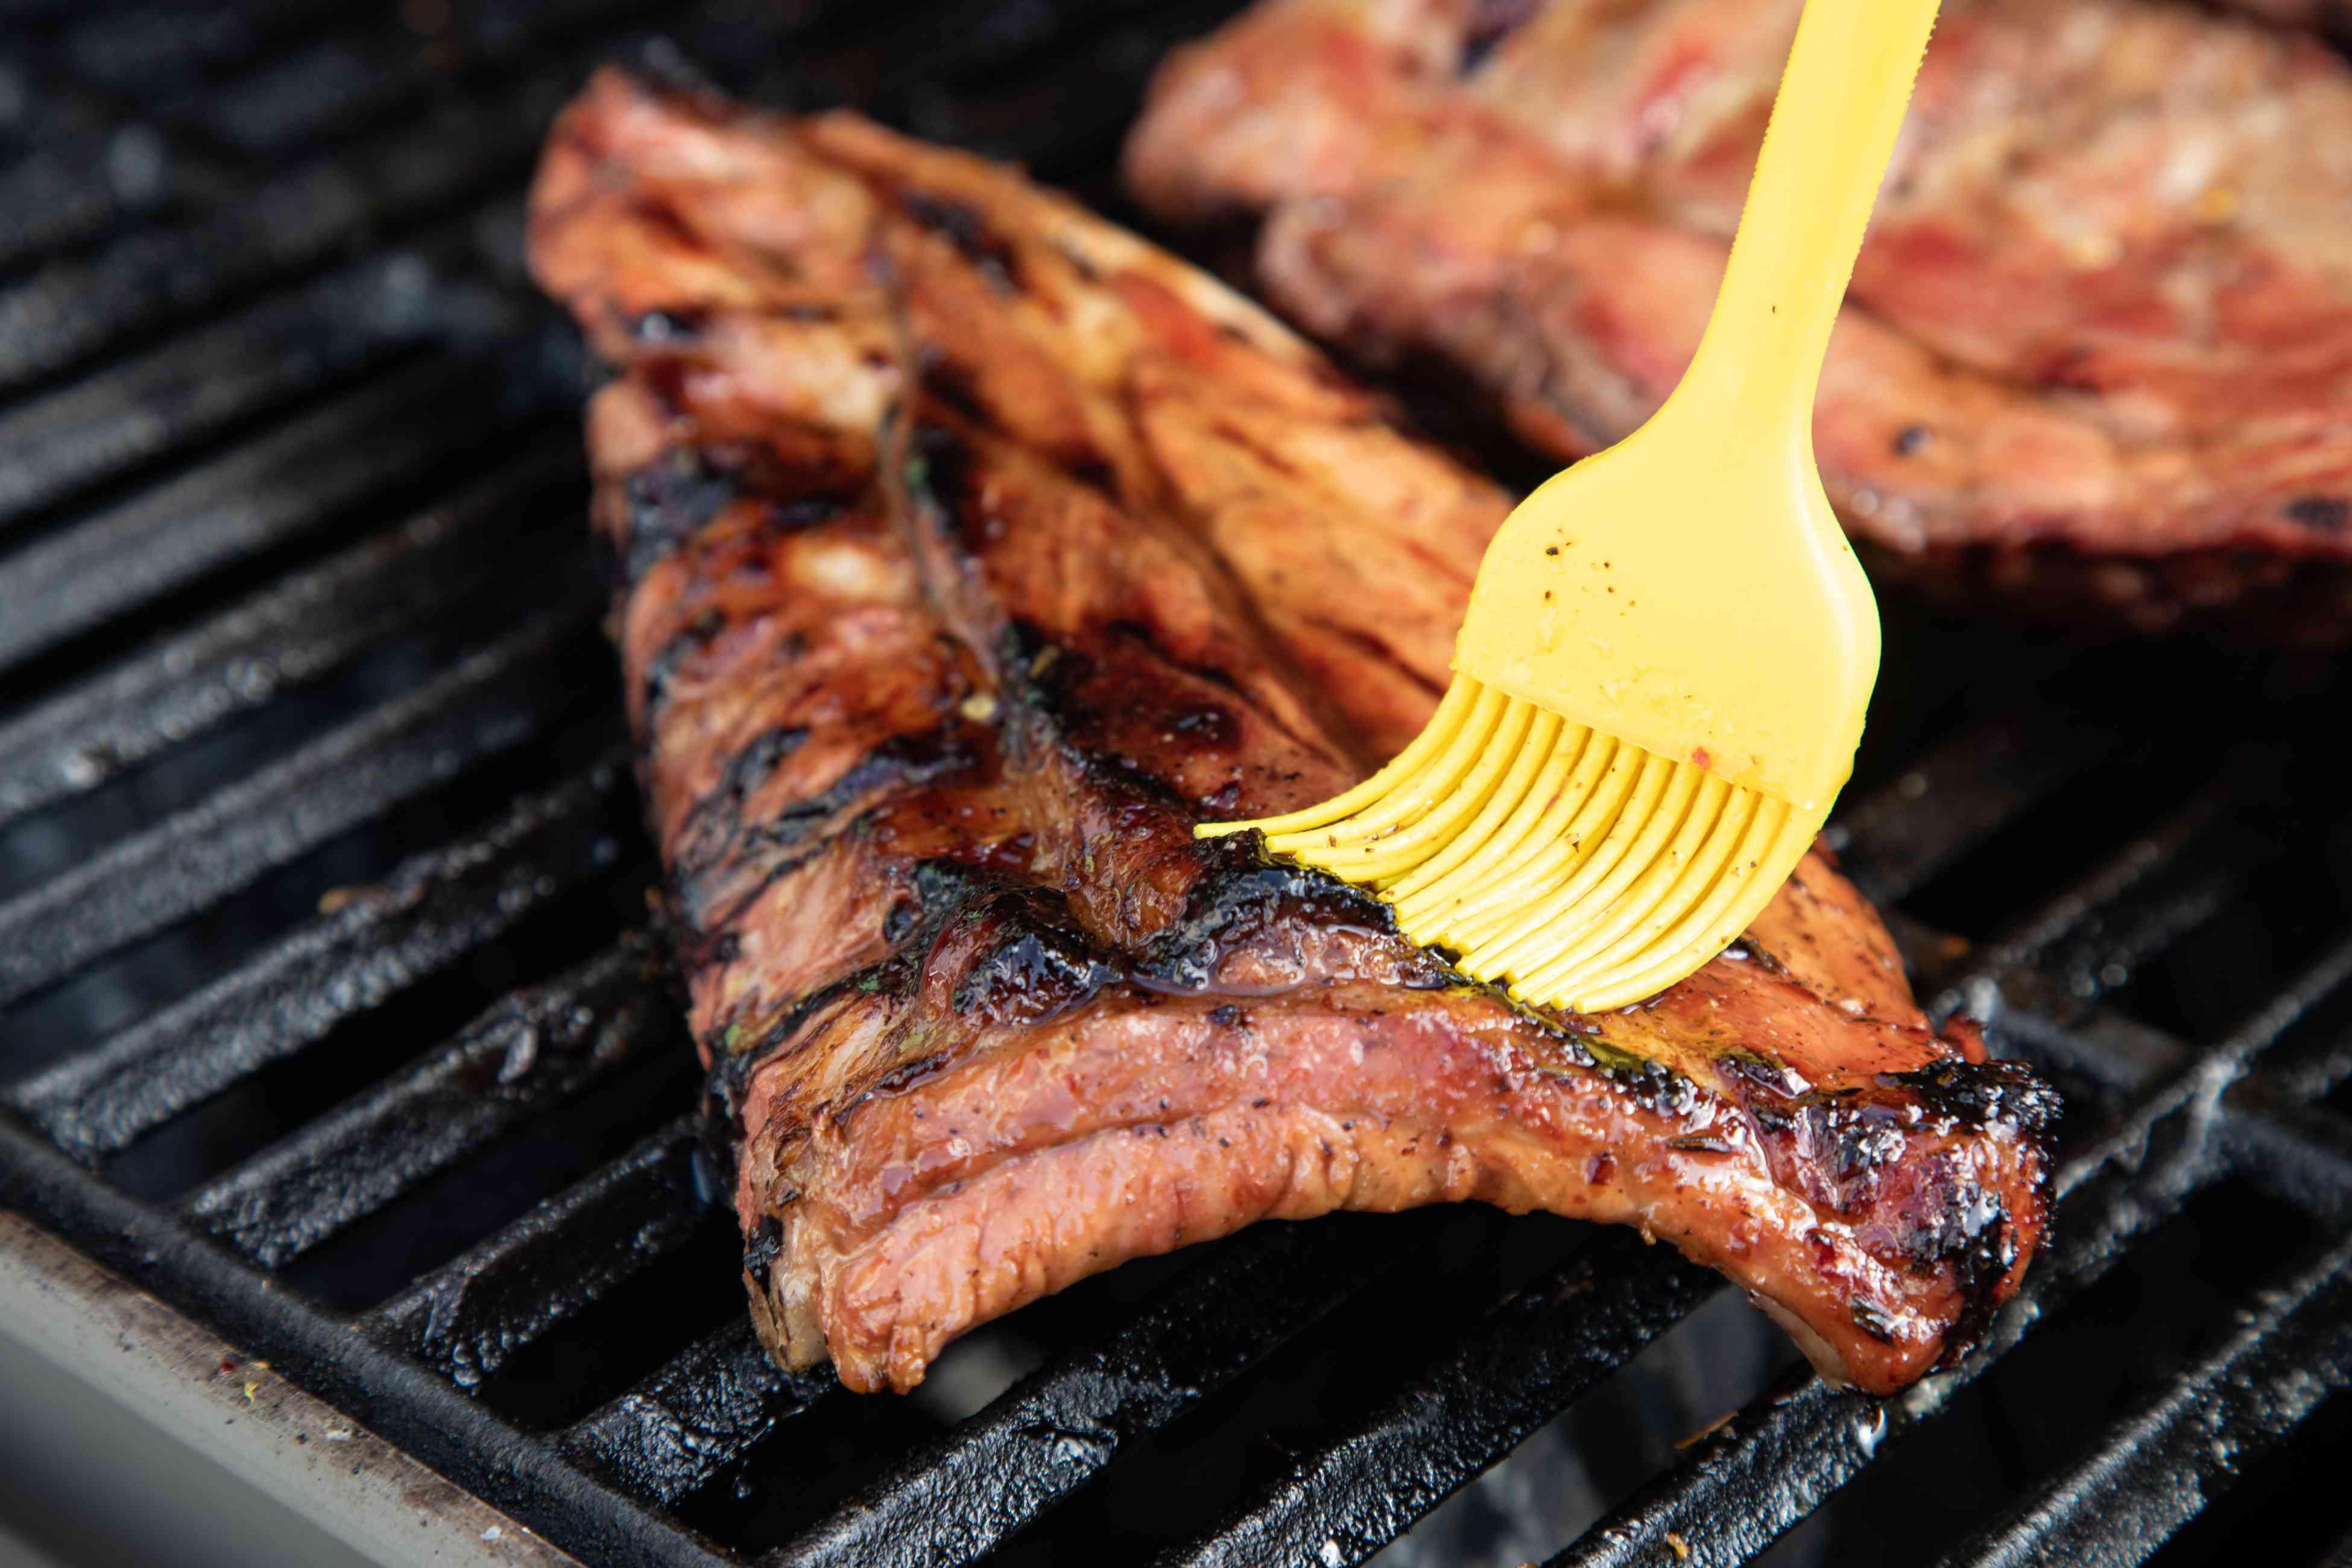 Basting grilled bbq ribs.